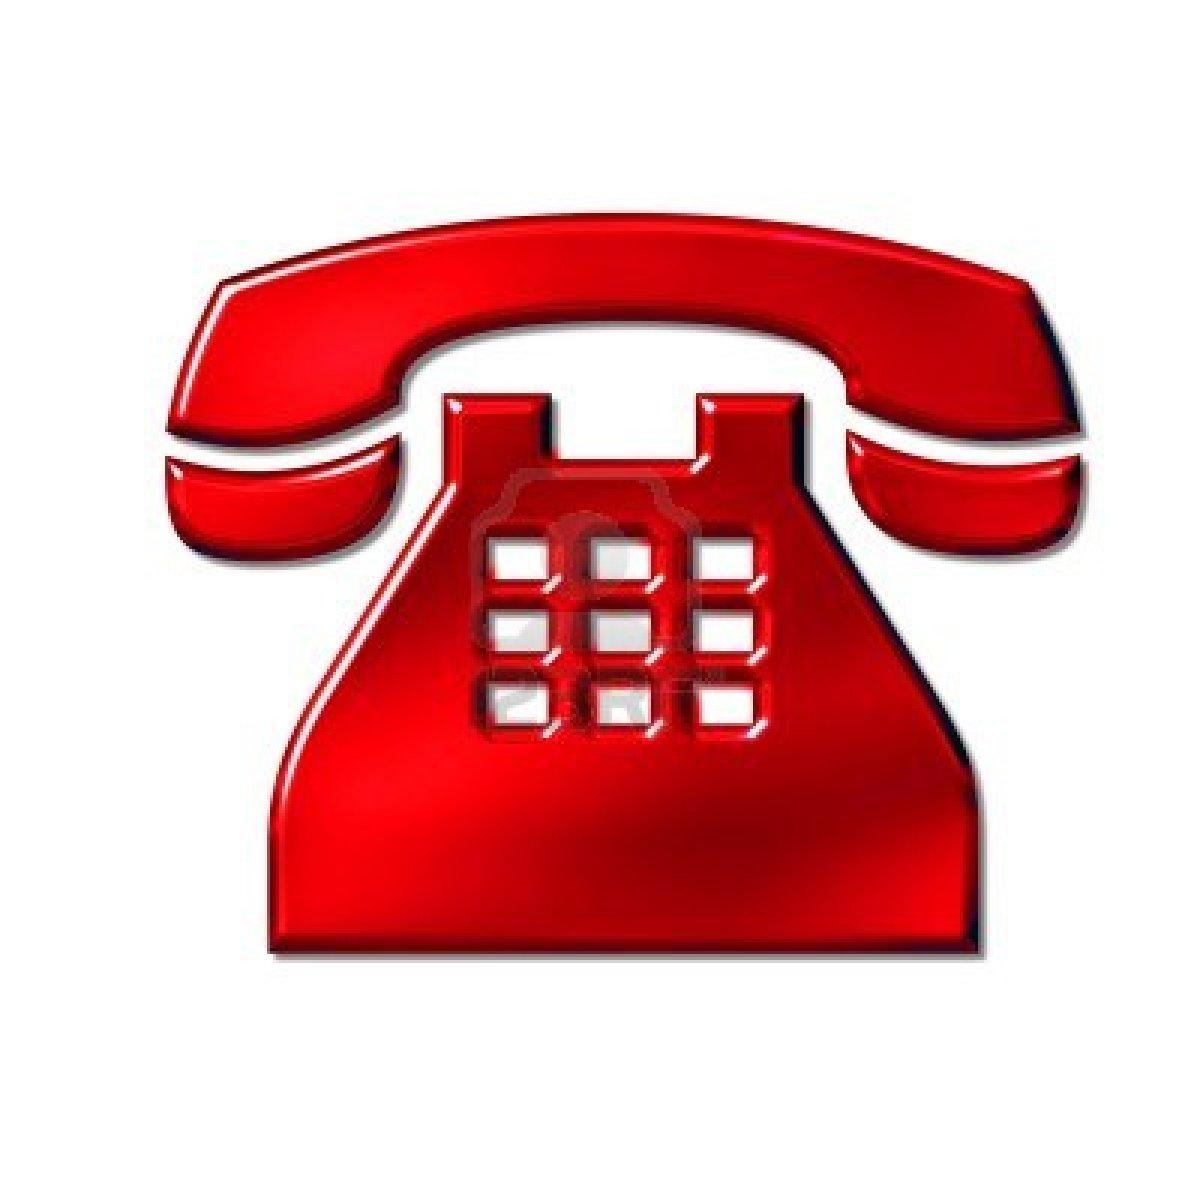 5294639-3d-rojo-signo-icono-de-telefono-en-blanco